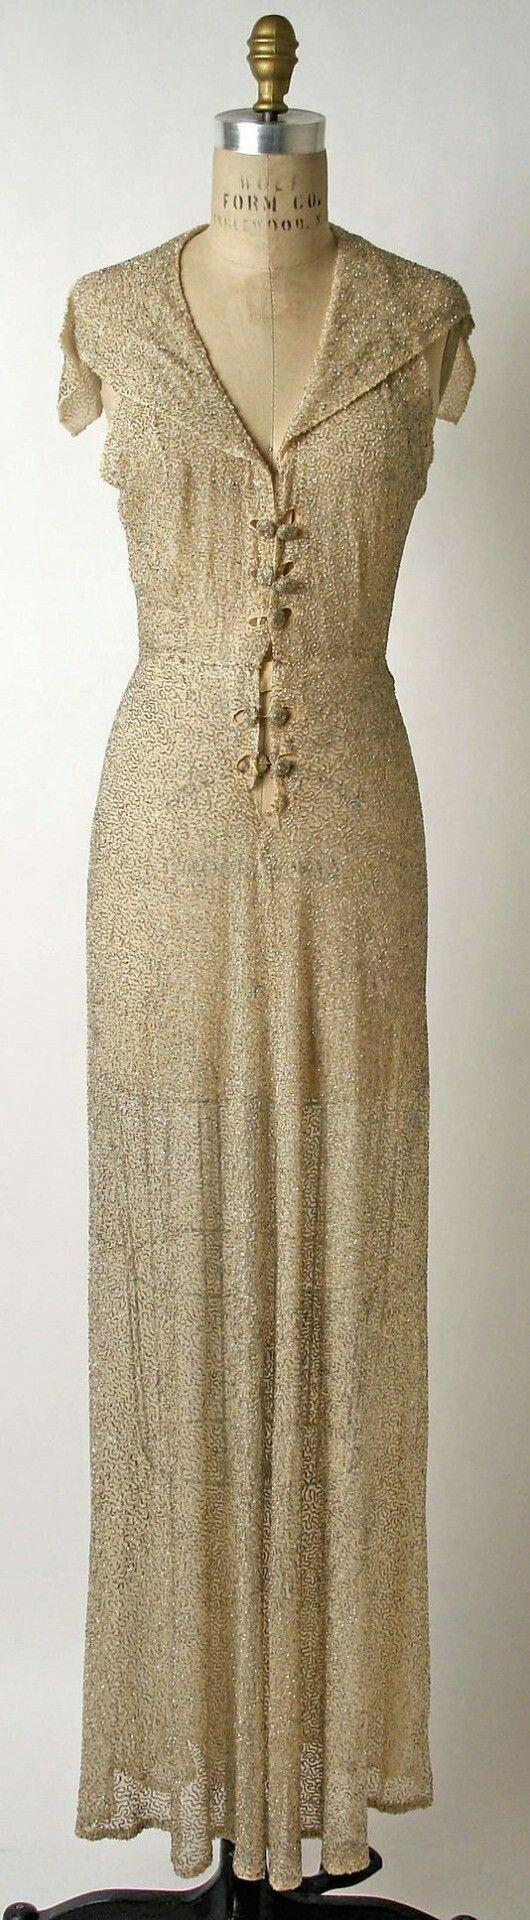 Robe de soirée en cristal, ca.1936  Sophie Gimbel pour Saks Fifth Avenue   Robe de soirée en cristal, ca.1936  Sophie Gimbel pour Saks Fifth Avenue